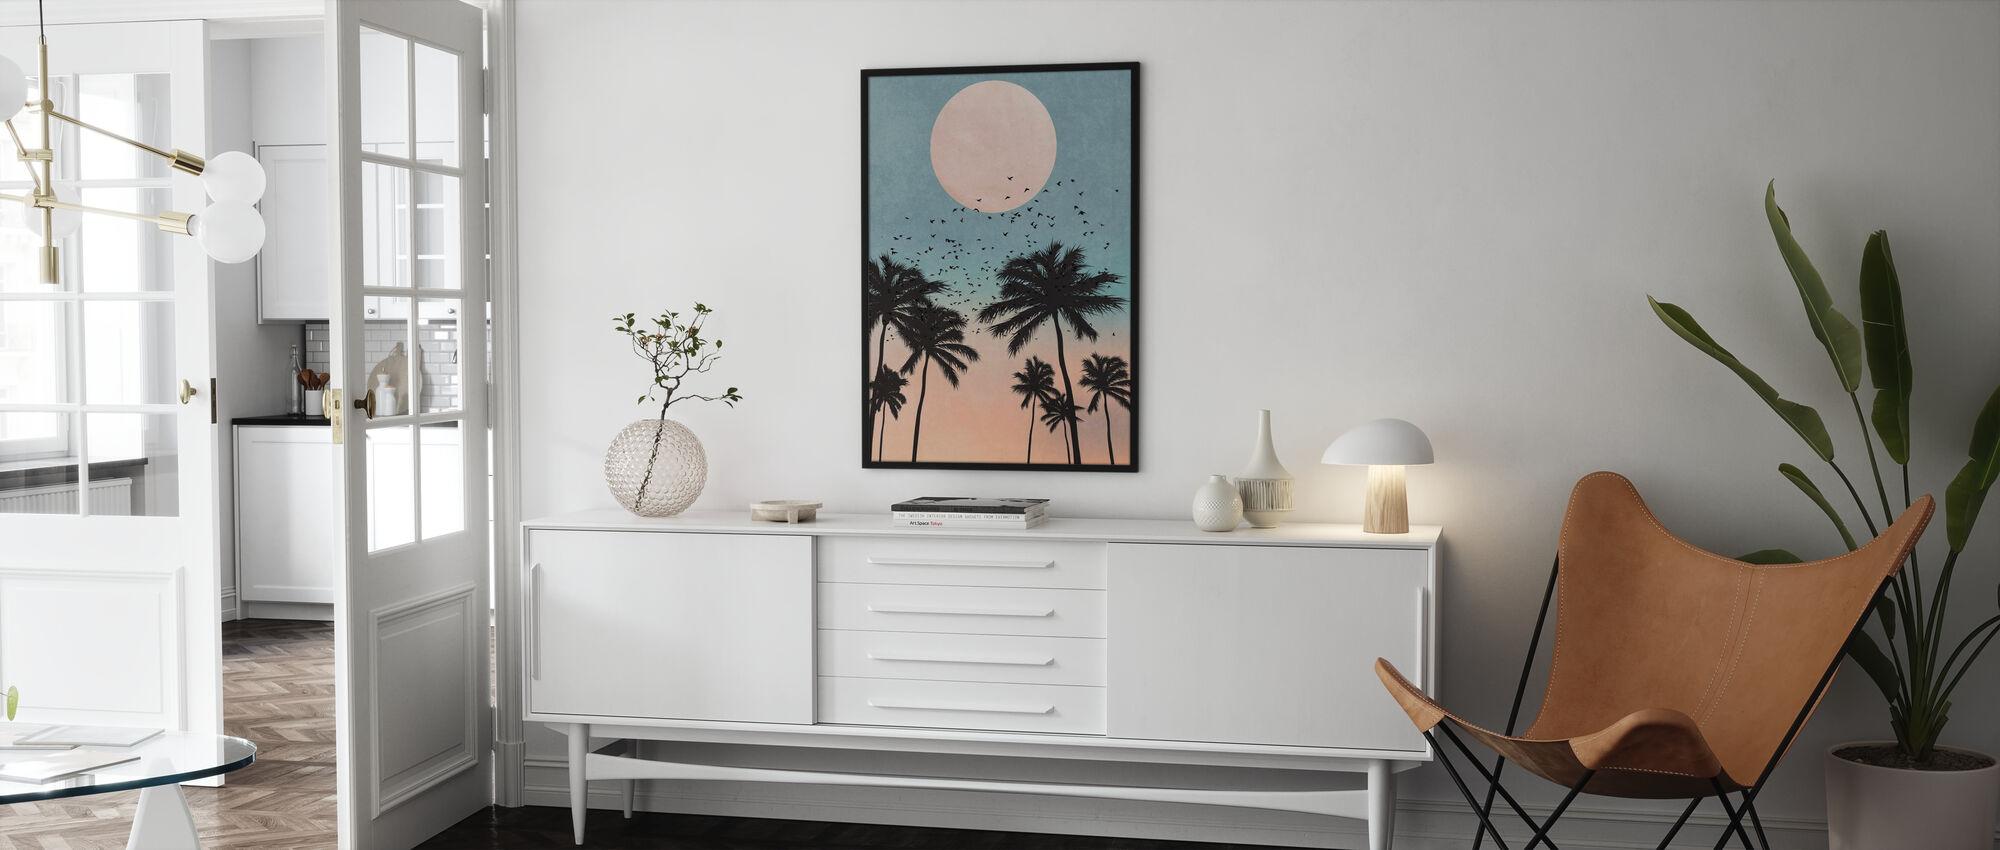 Zonsopgang - Ingelijste print - Woonkamer